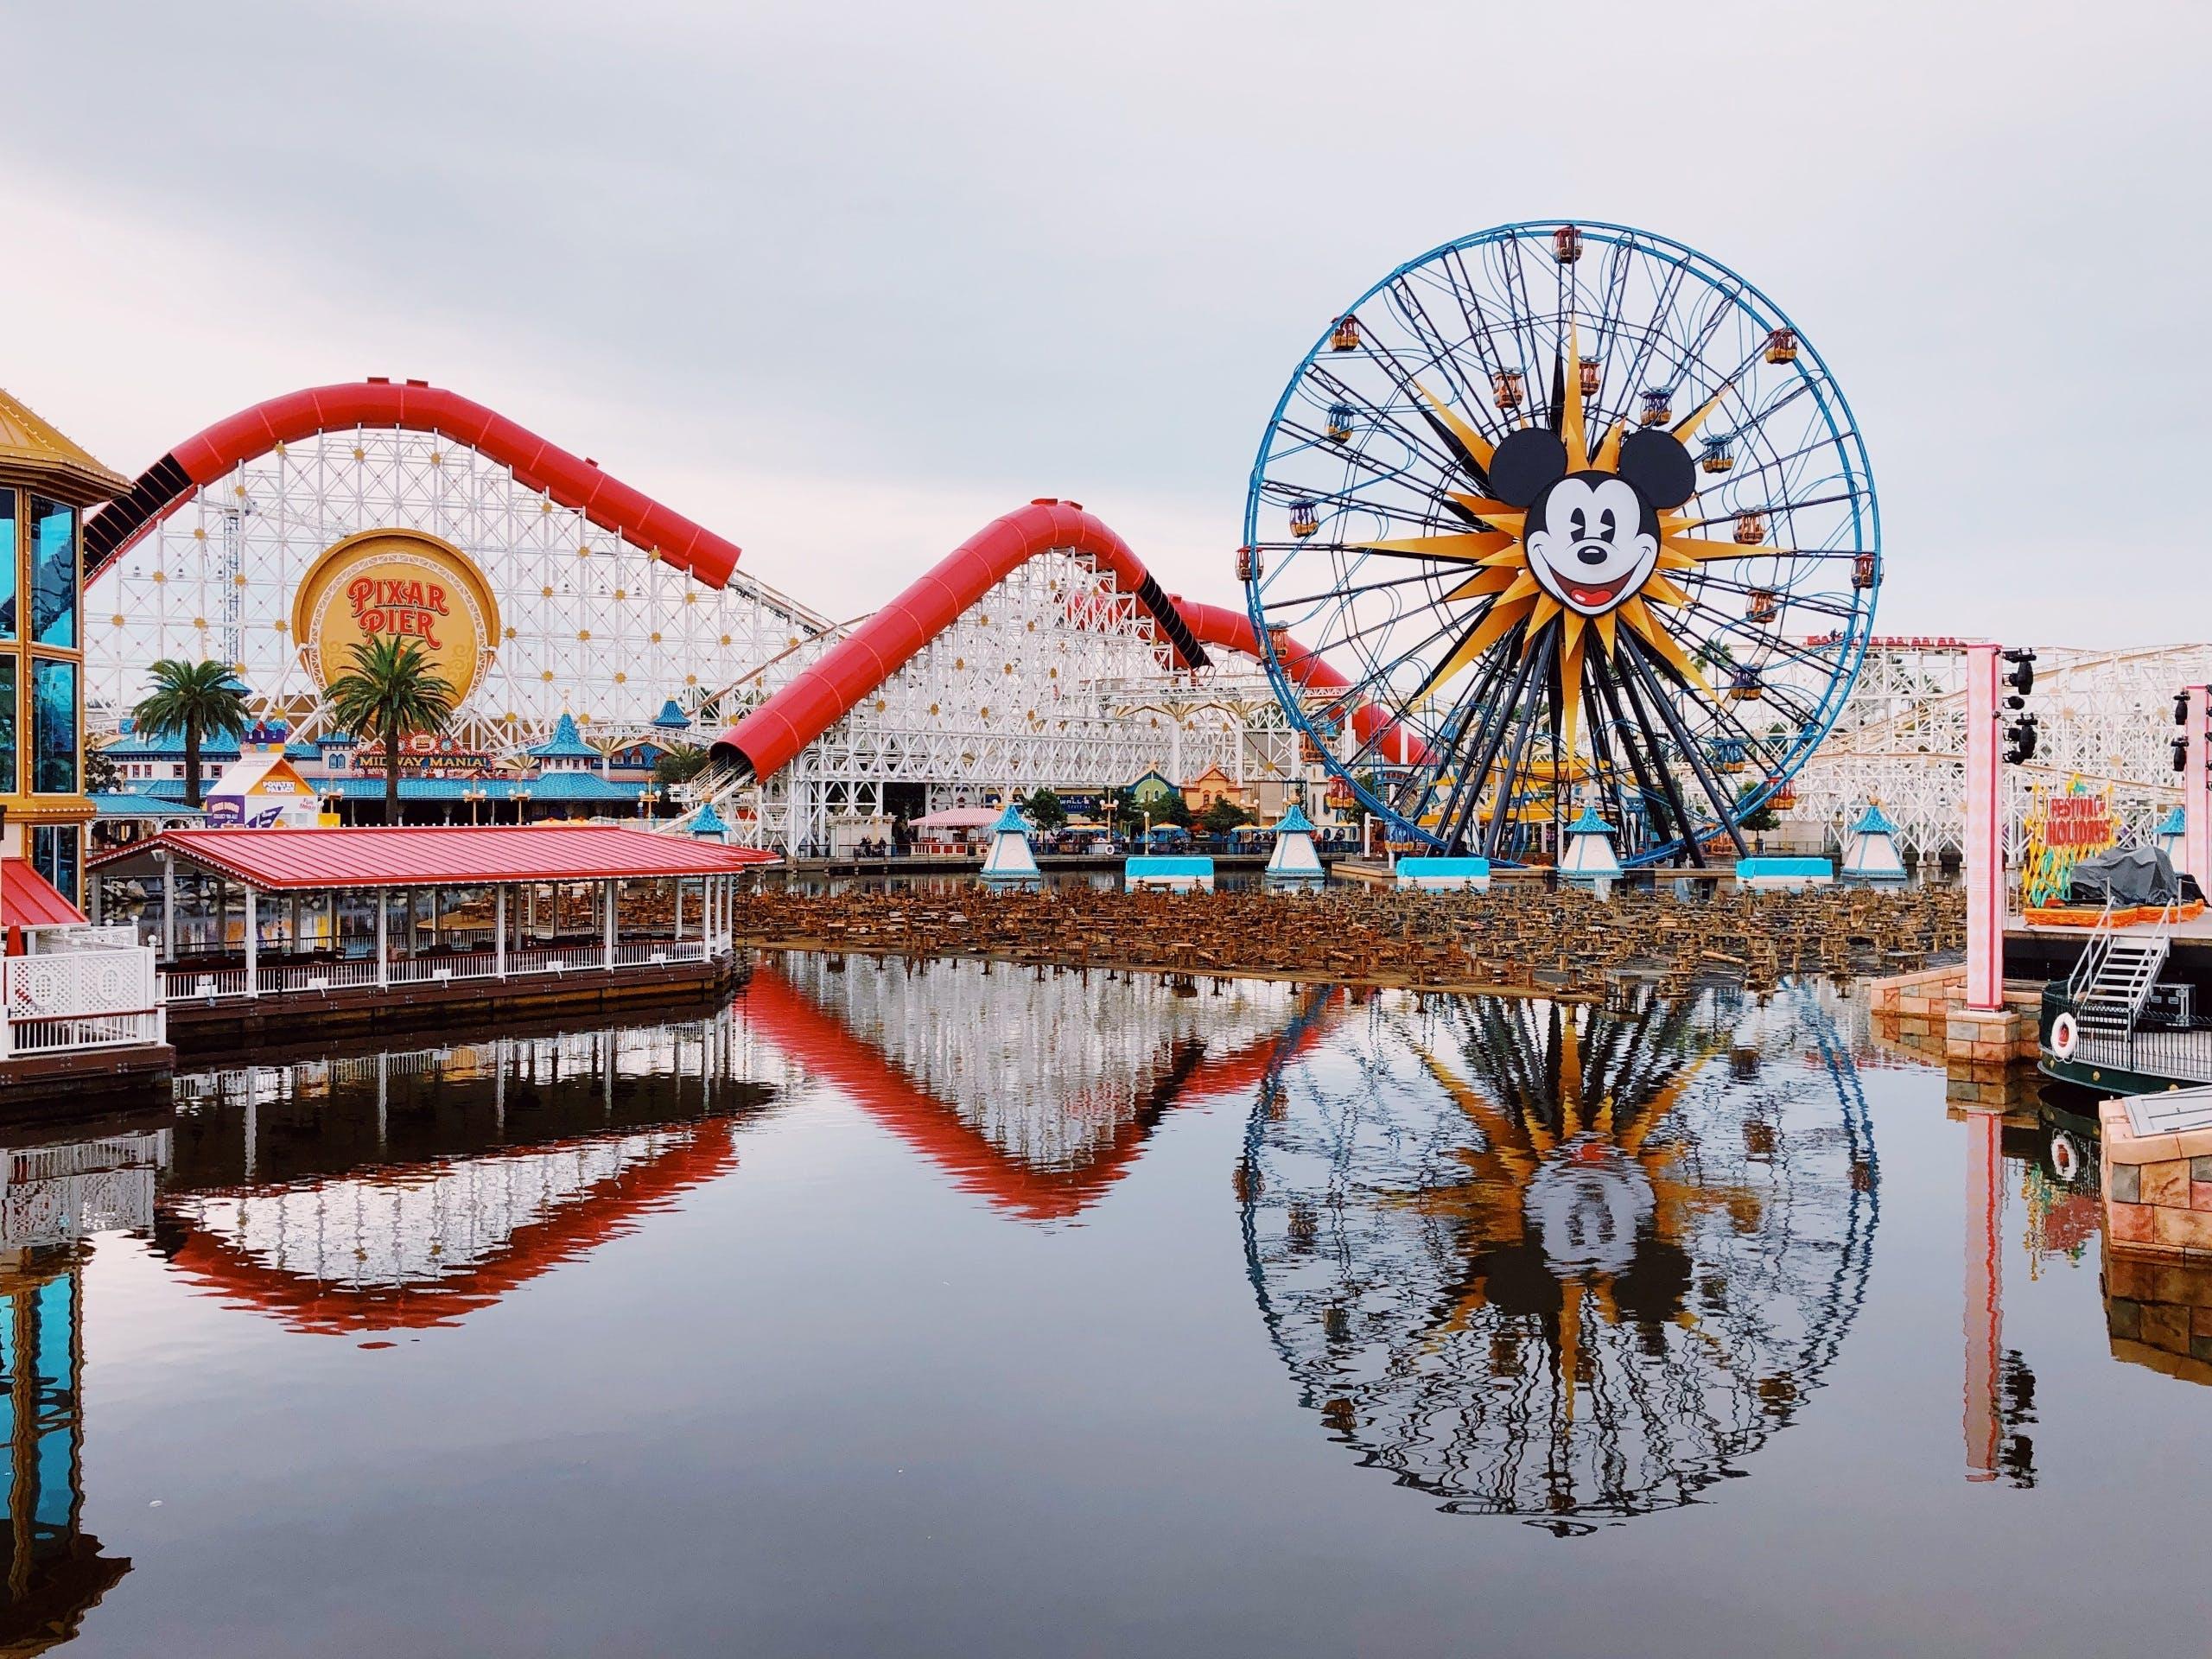 Disneyland rollercoaster and ferris wheel